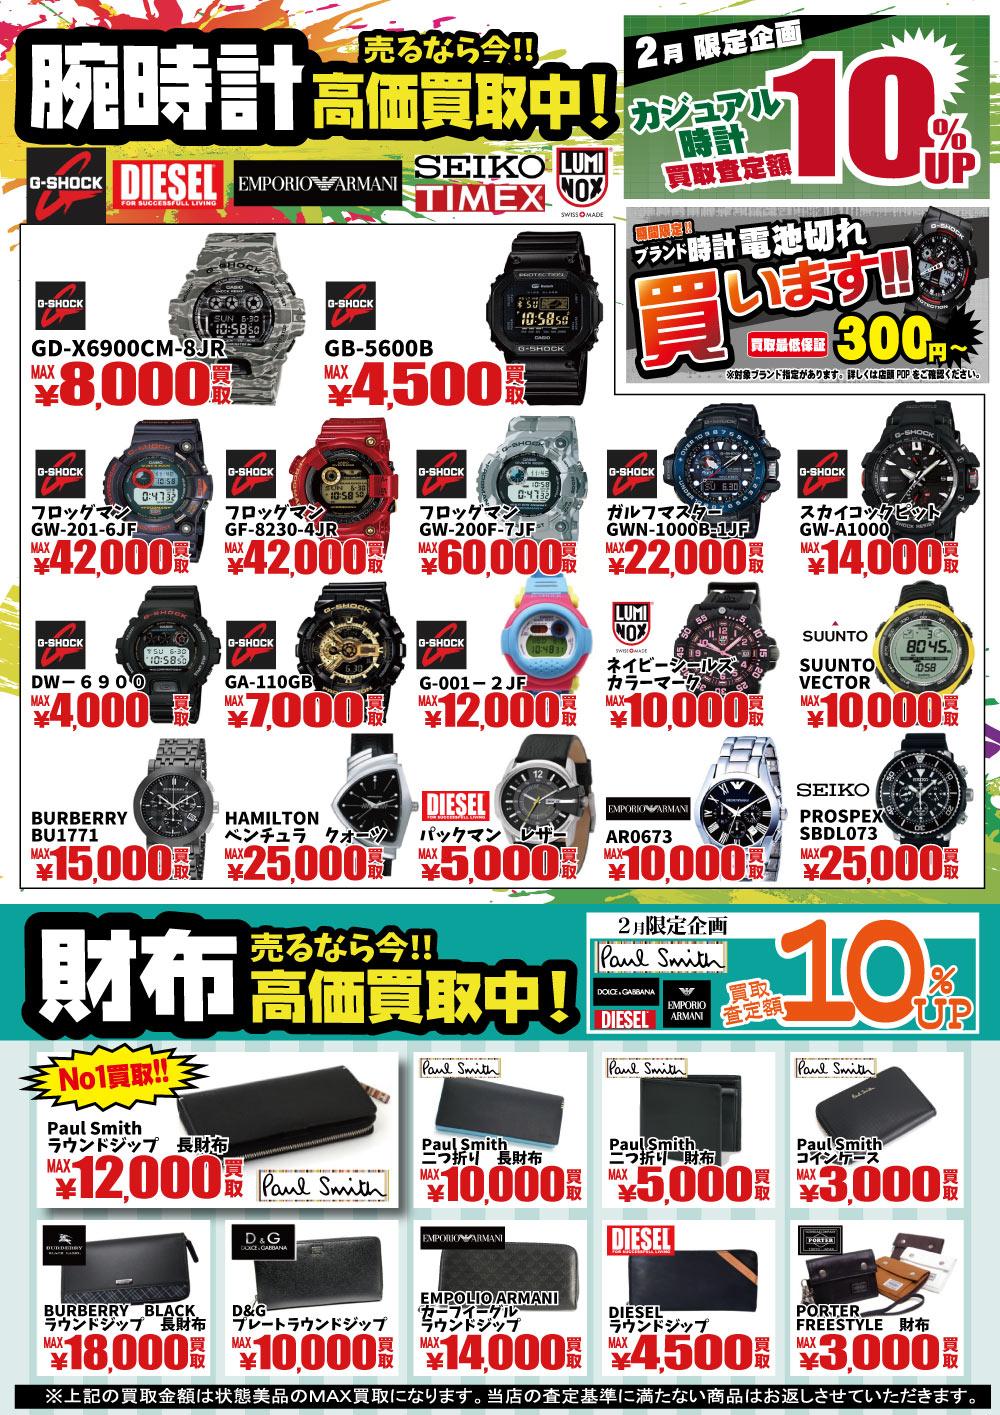 「開放倉庫山城店」2017年2月限定買取企画!腕時計、財布を売るなら今!!高価買取中!